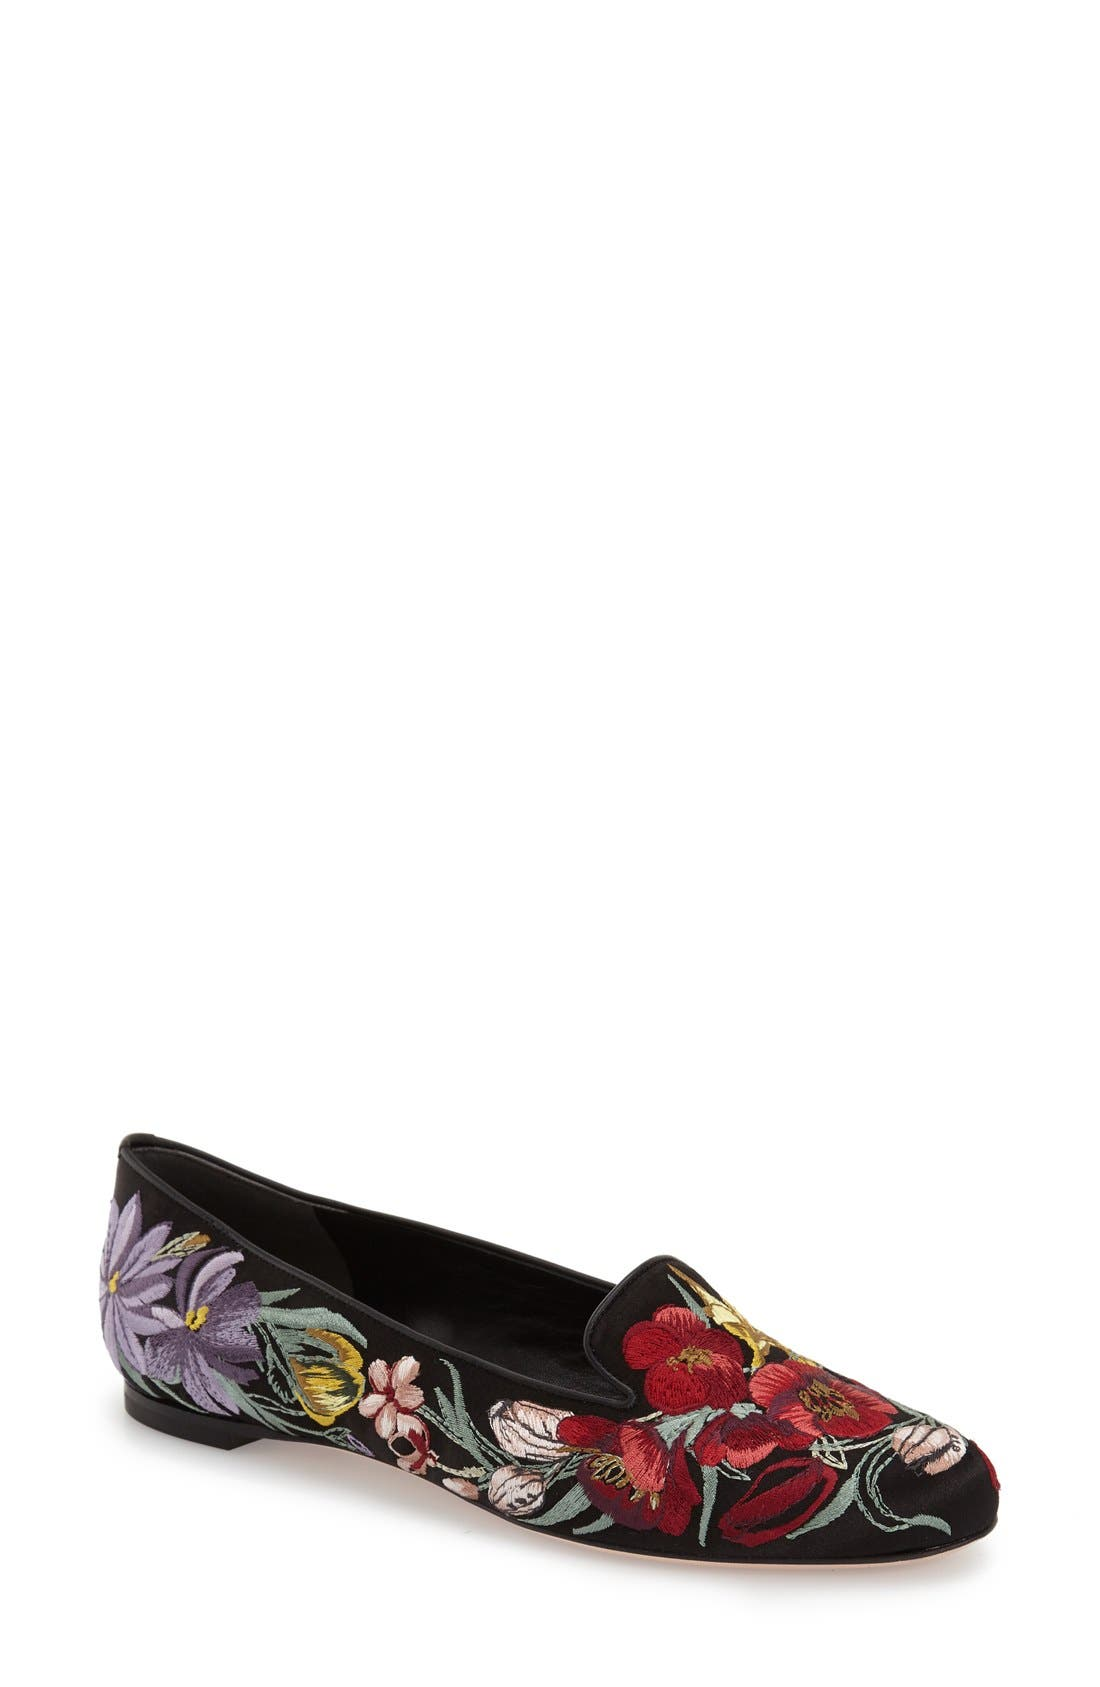 Main Image - Alexander McQueen Embroidered Flower Loafer (Women)